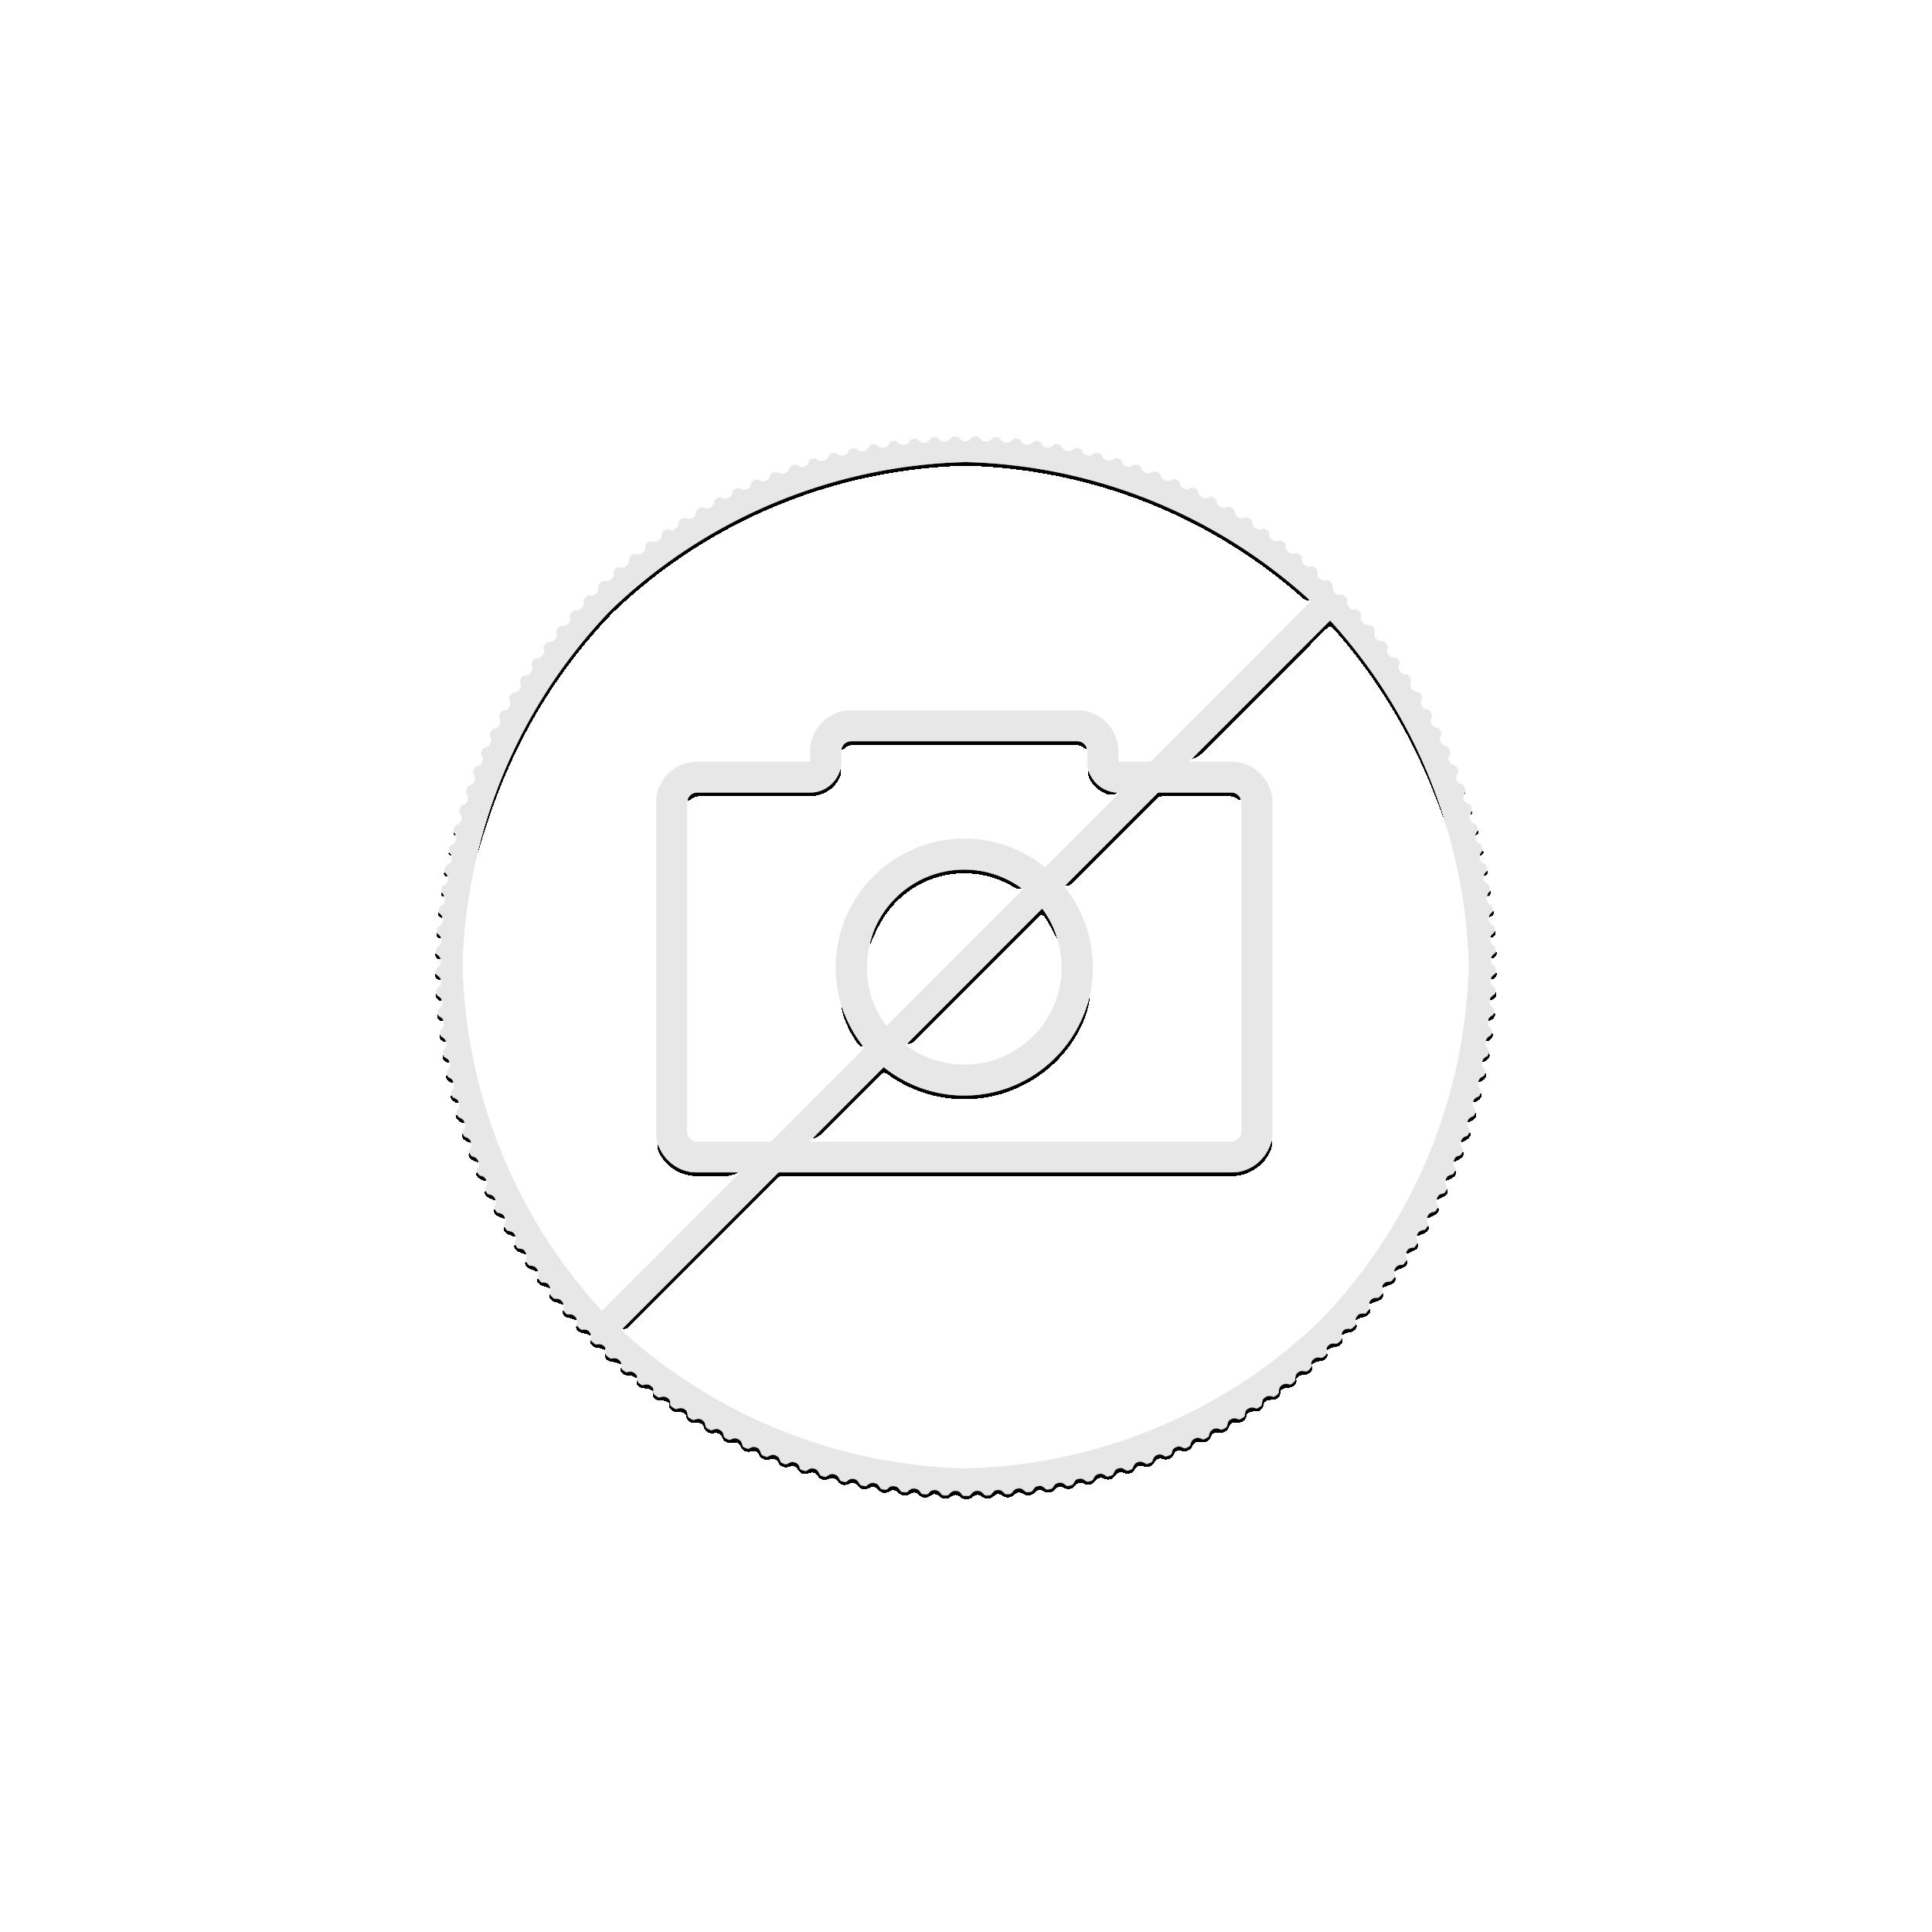 1 troy ounce gold coin Maid Marian 2022